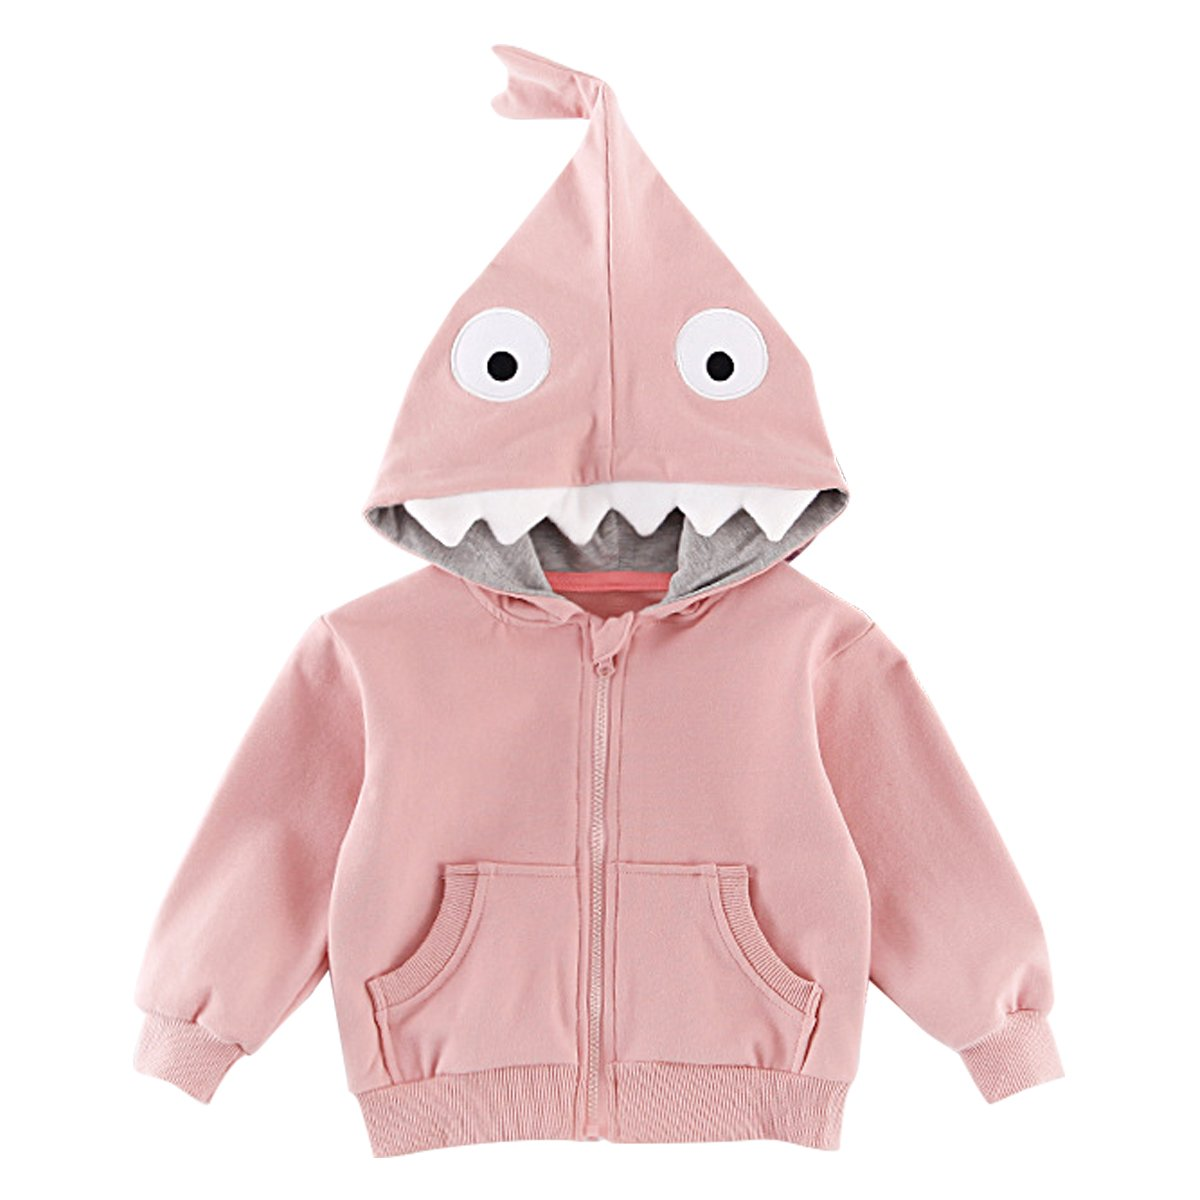 Kanodan Baby Boys Shark Outerwear Jacket Toddler Hooded Autumn Sweatshirt 1-4Years